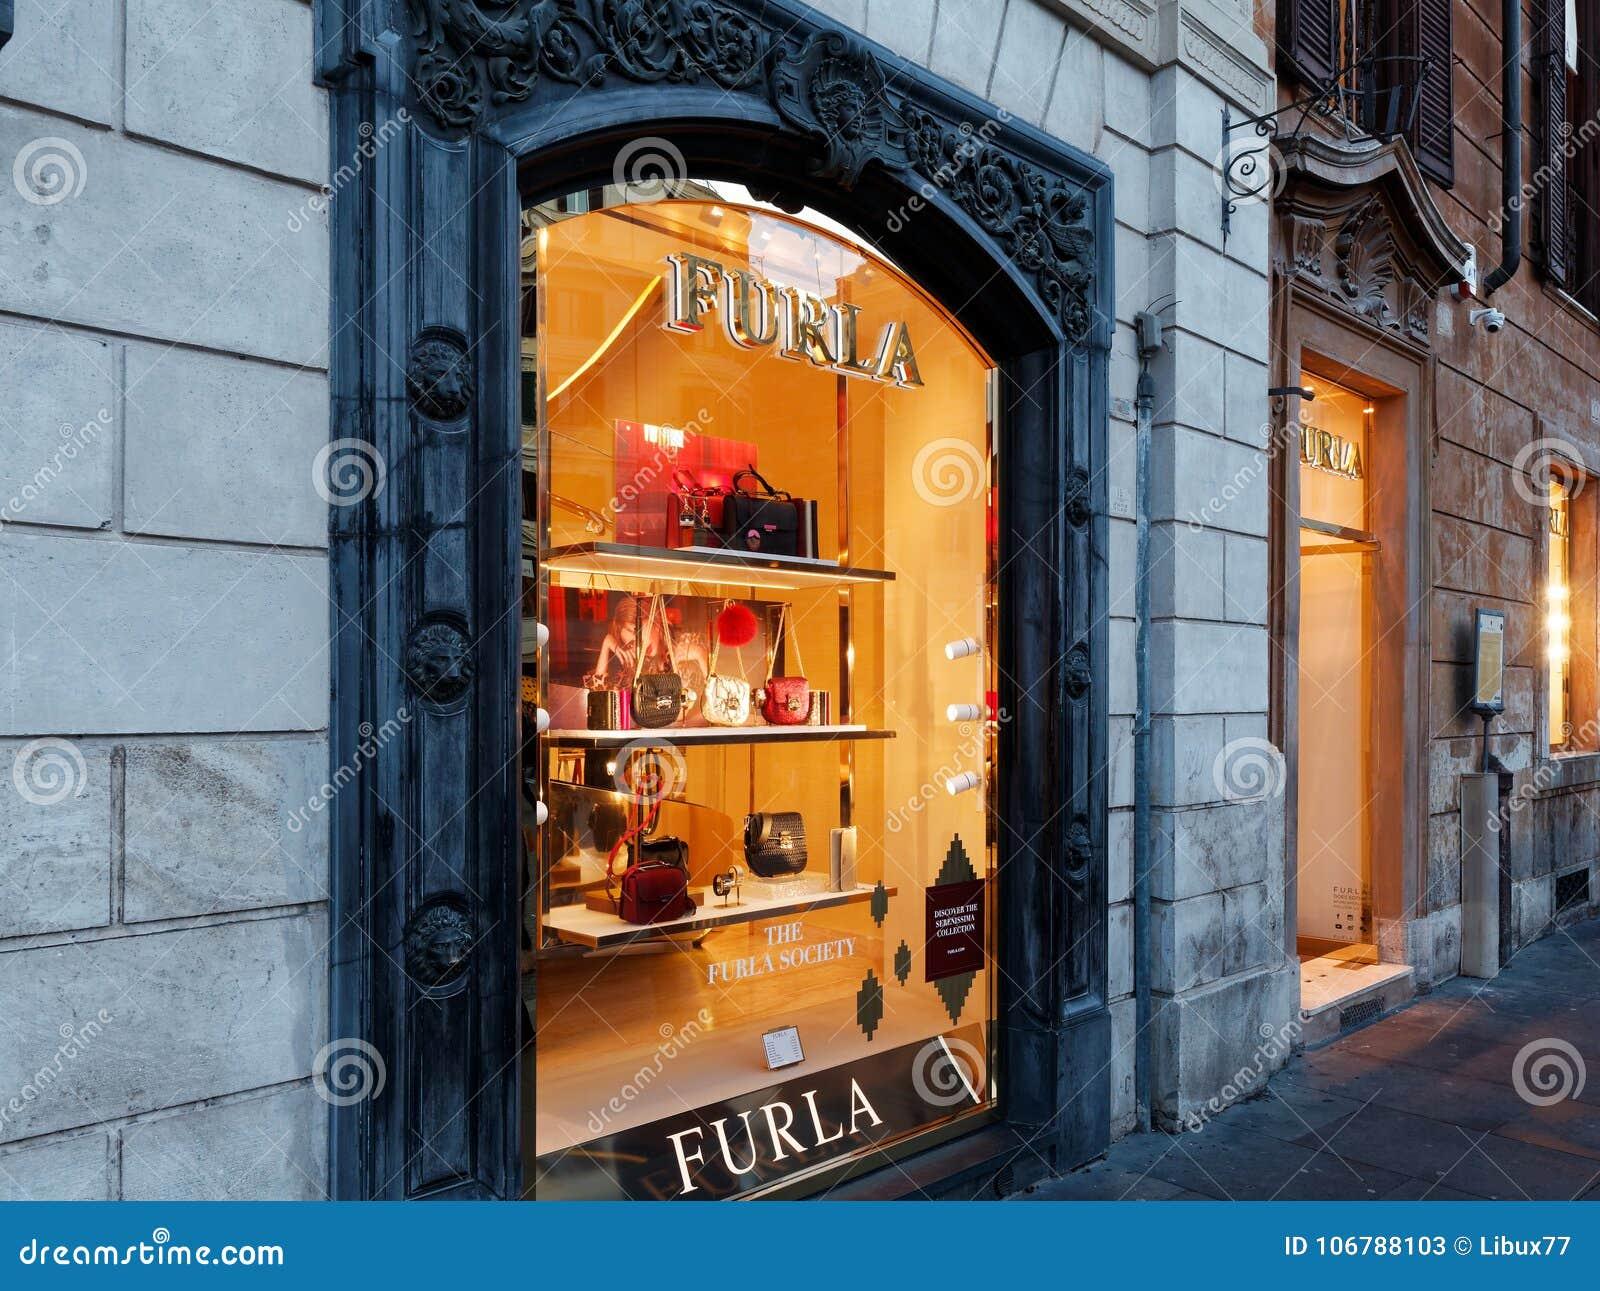 Furla Window Shop At Spain Square Rome Editorial Stock